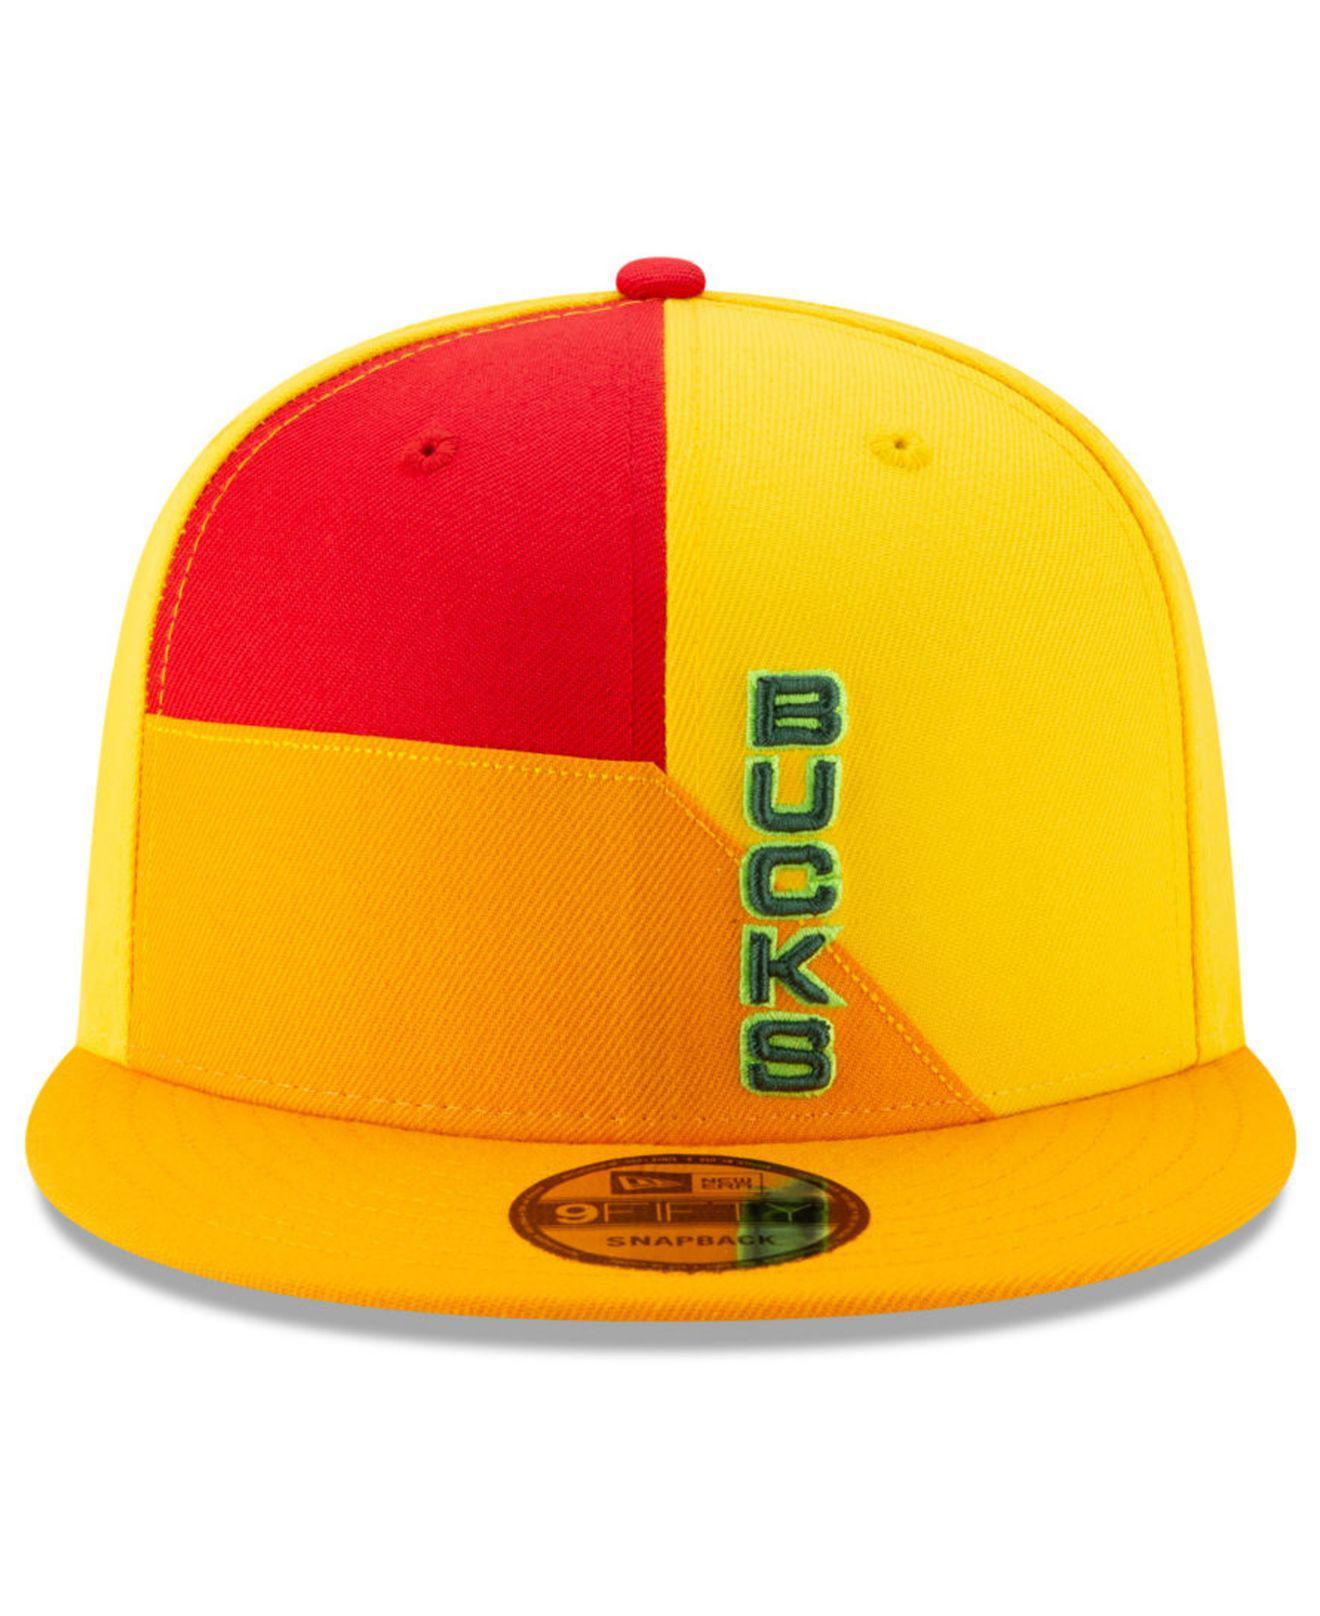 9f3c1024585 Lyst - KTZ Milwaukee Bucks City Series 2.0 9fifty Snapback Cap in Yellow  for Men